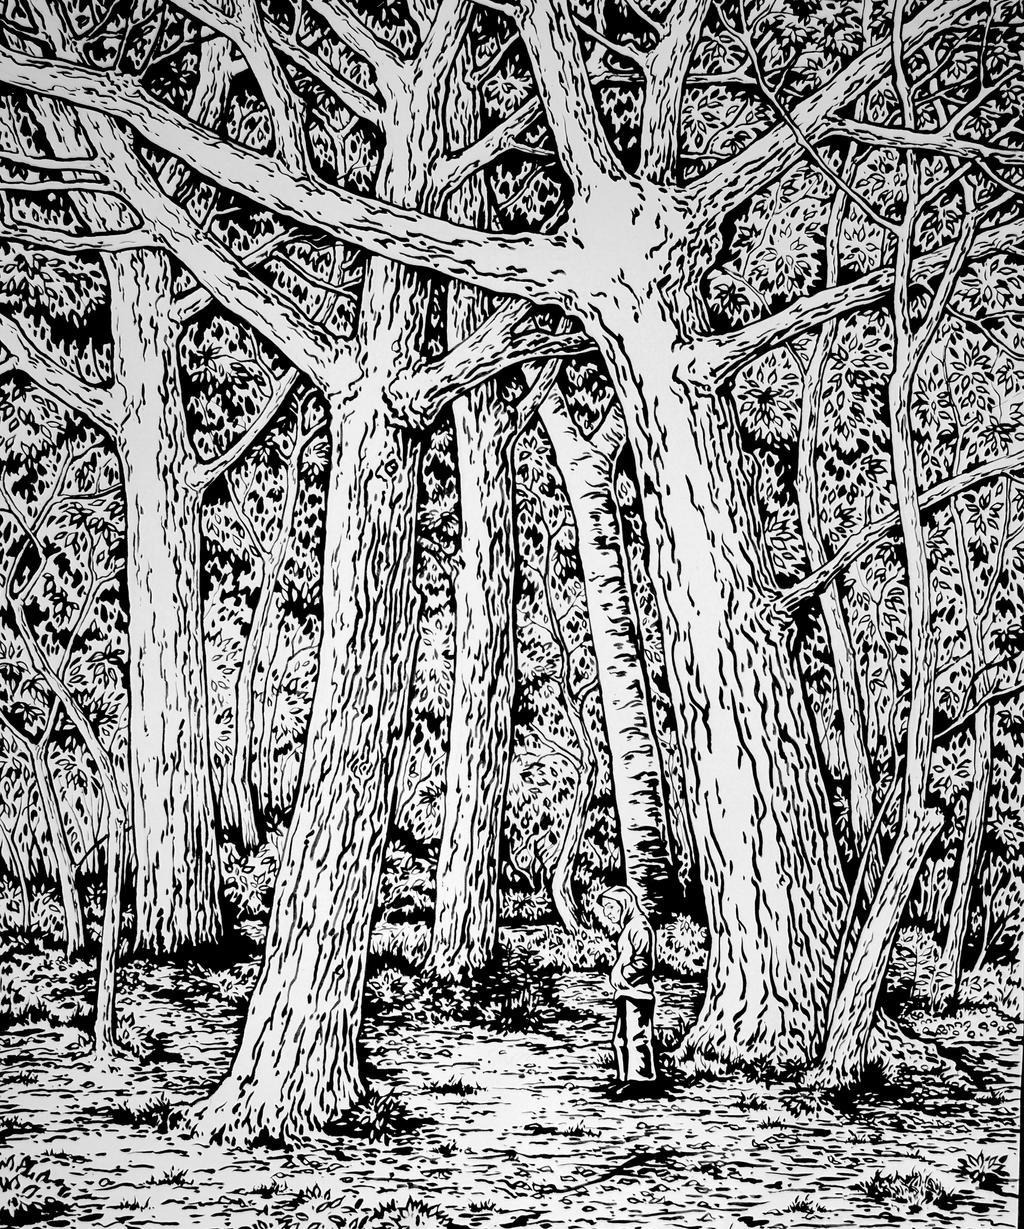 Una Selva Oscura by asantell